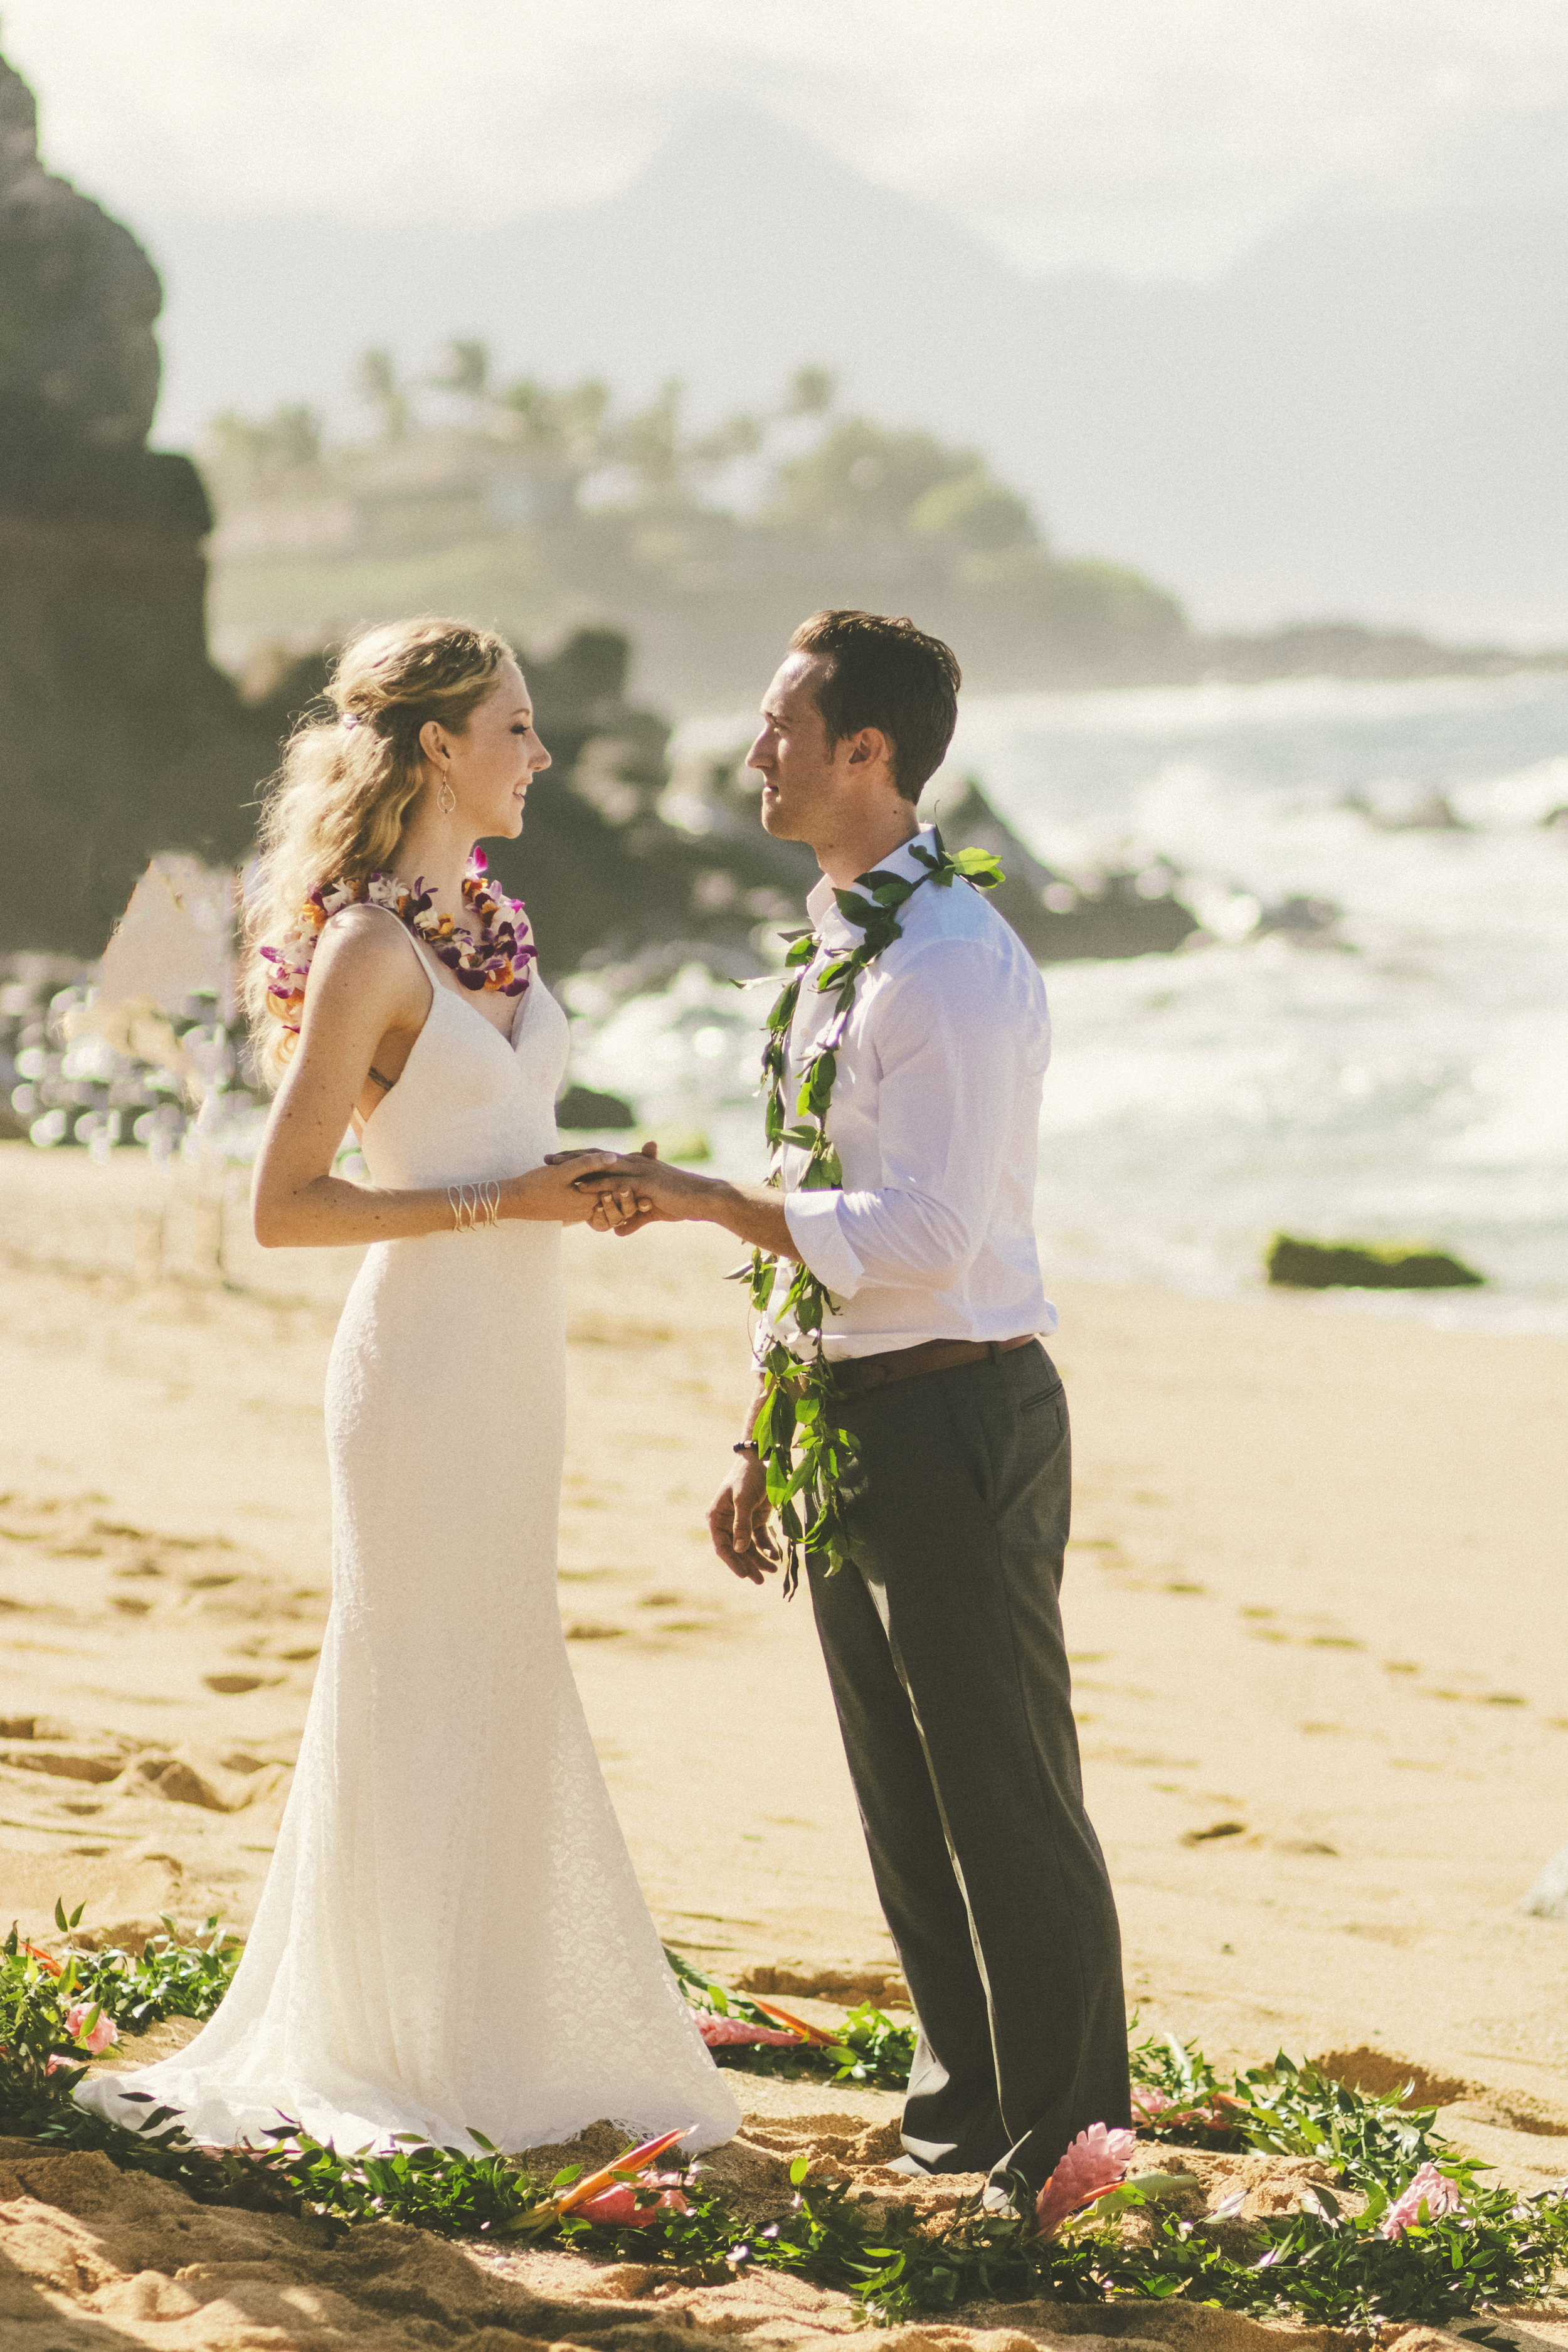 angie-diaz-photography-maui-wedding-50.jpg